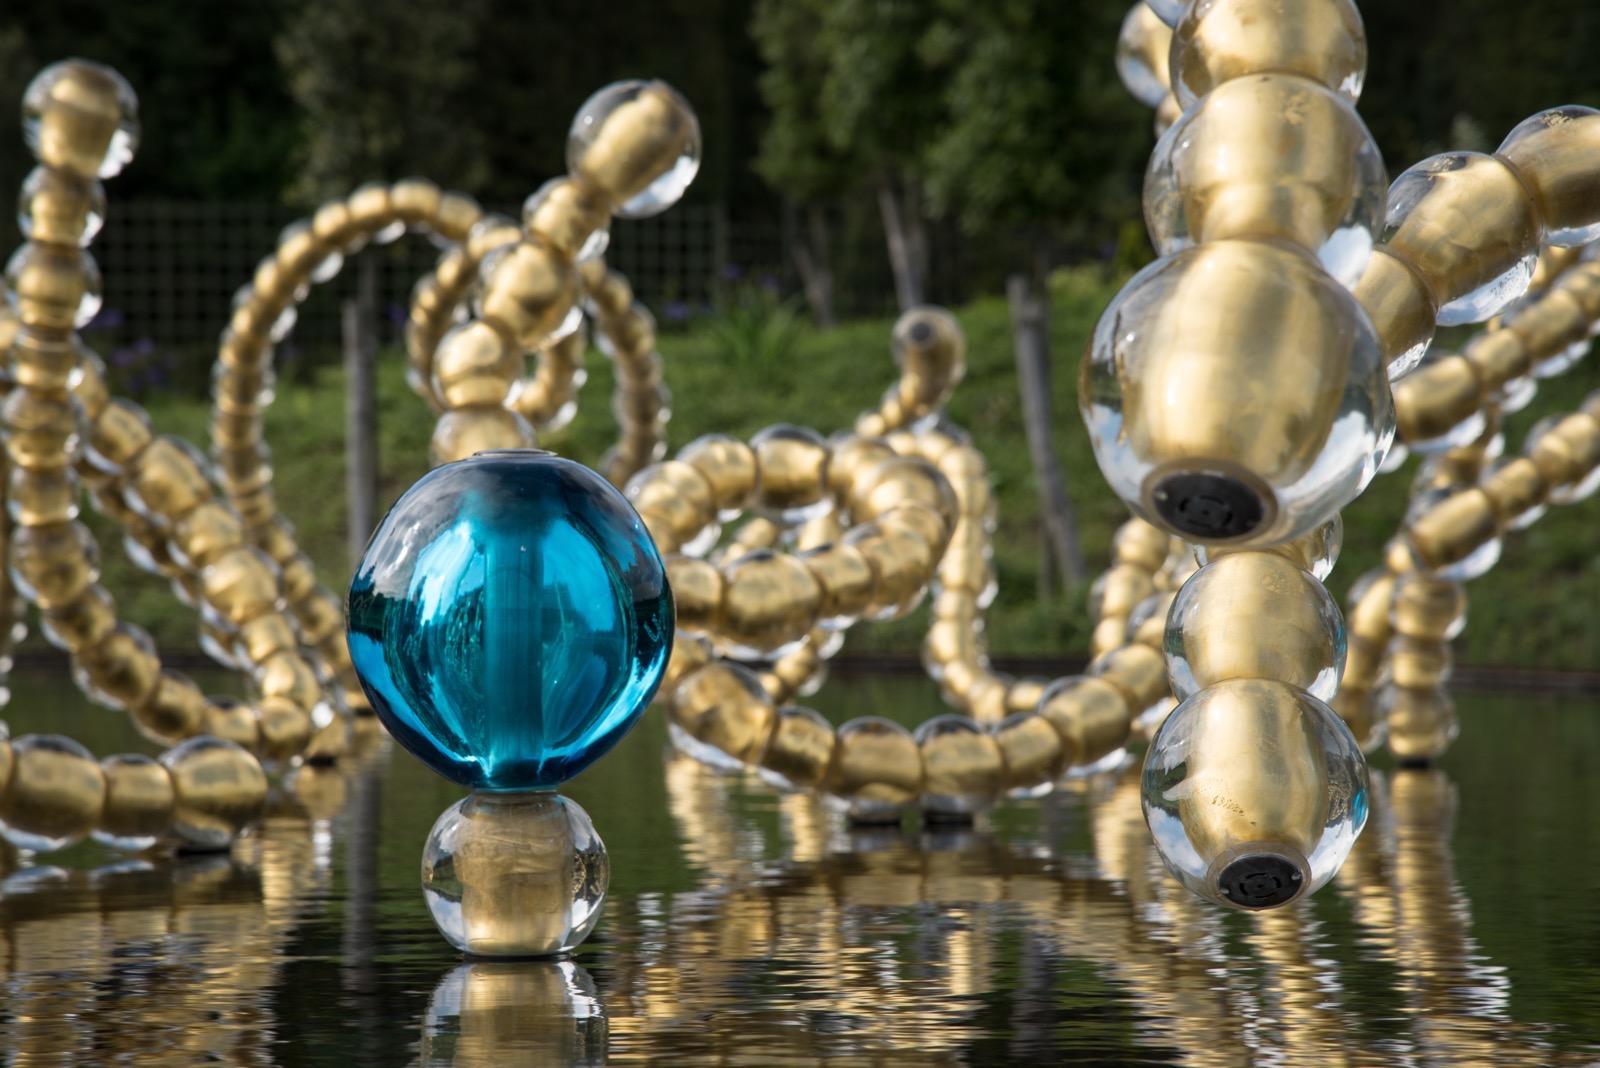 Jean Michel Othoniel sculpture